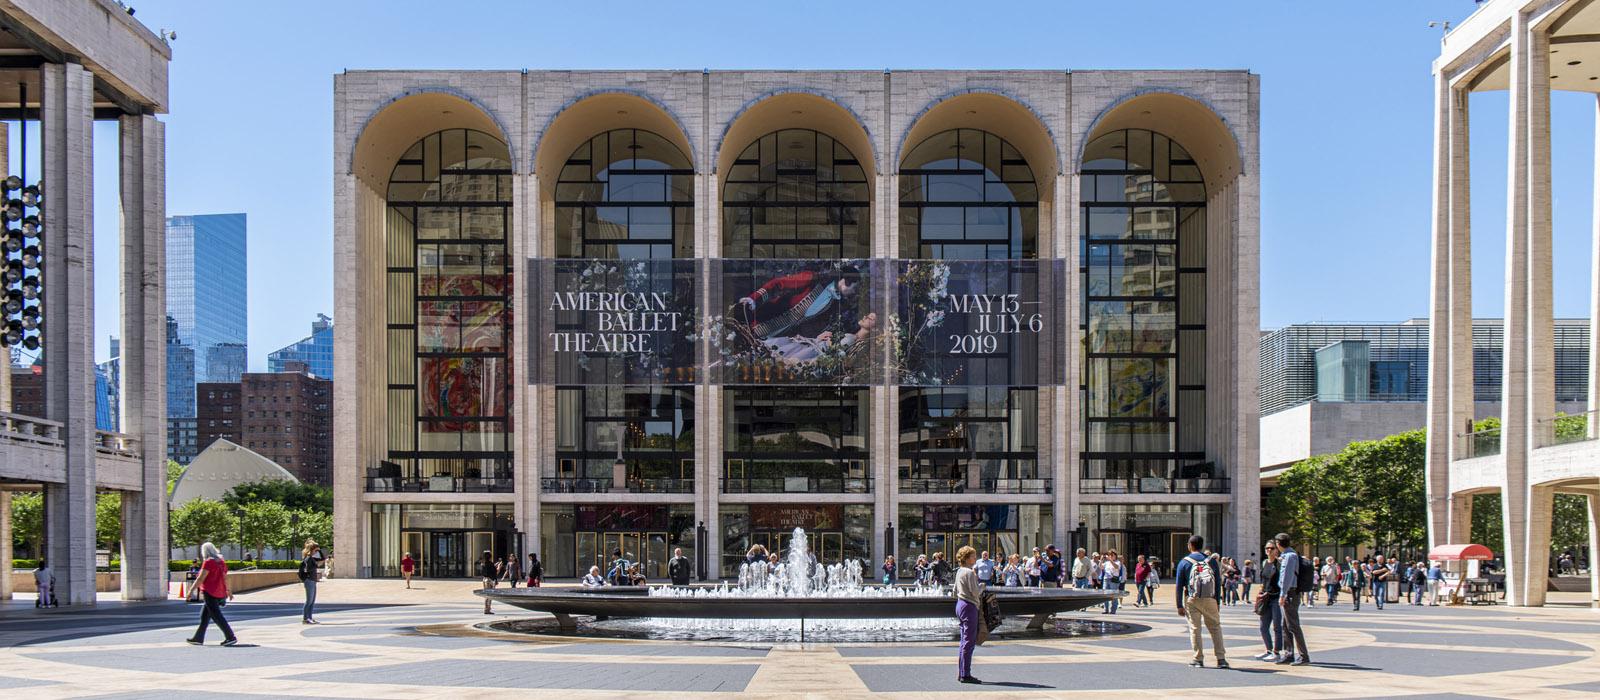 The Met Opera house